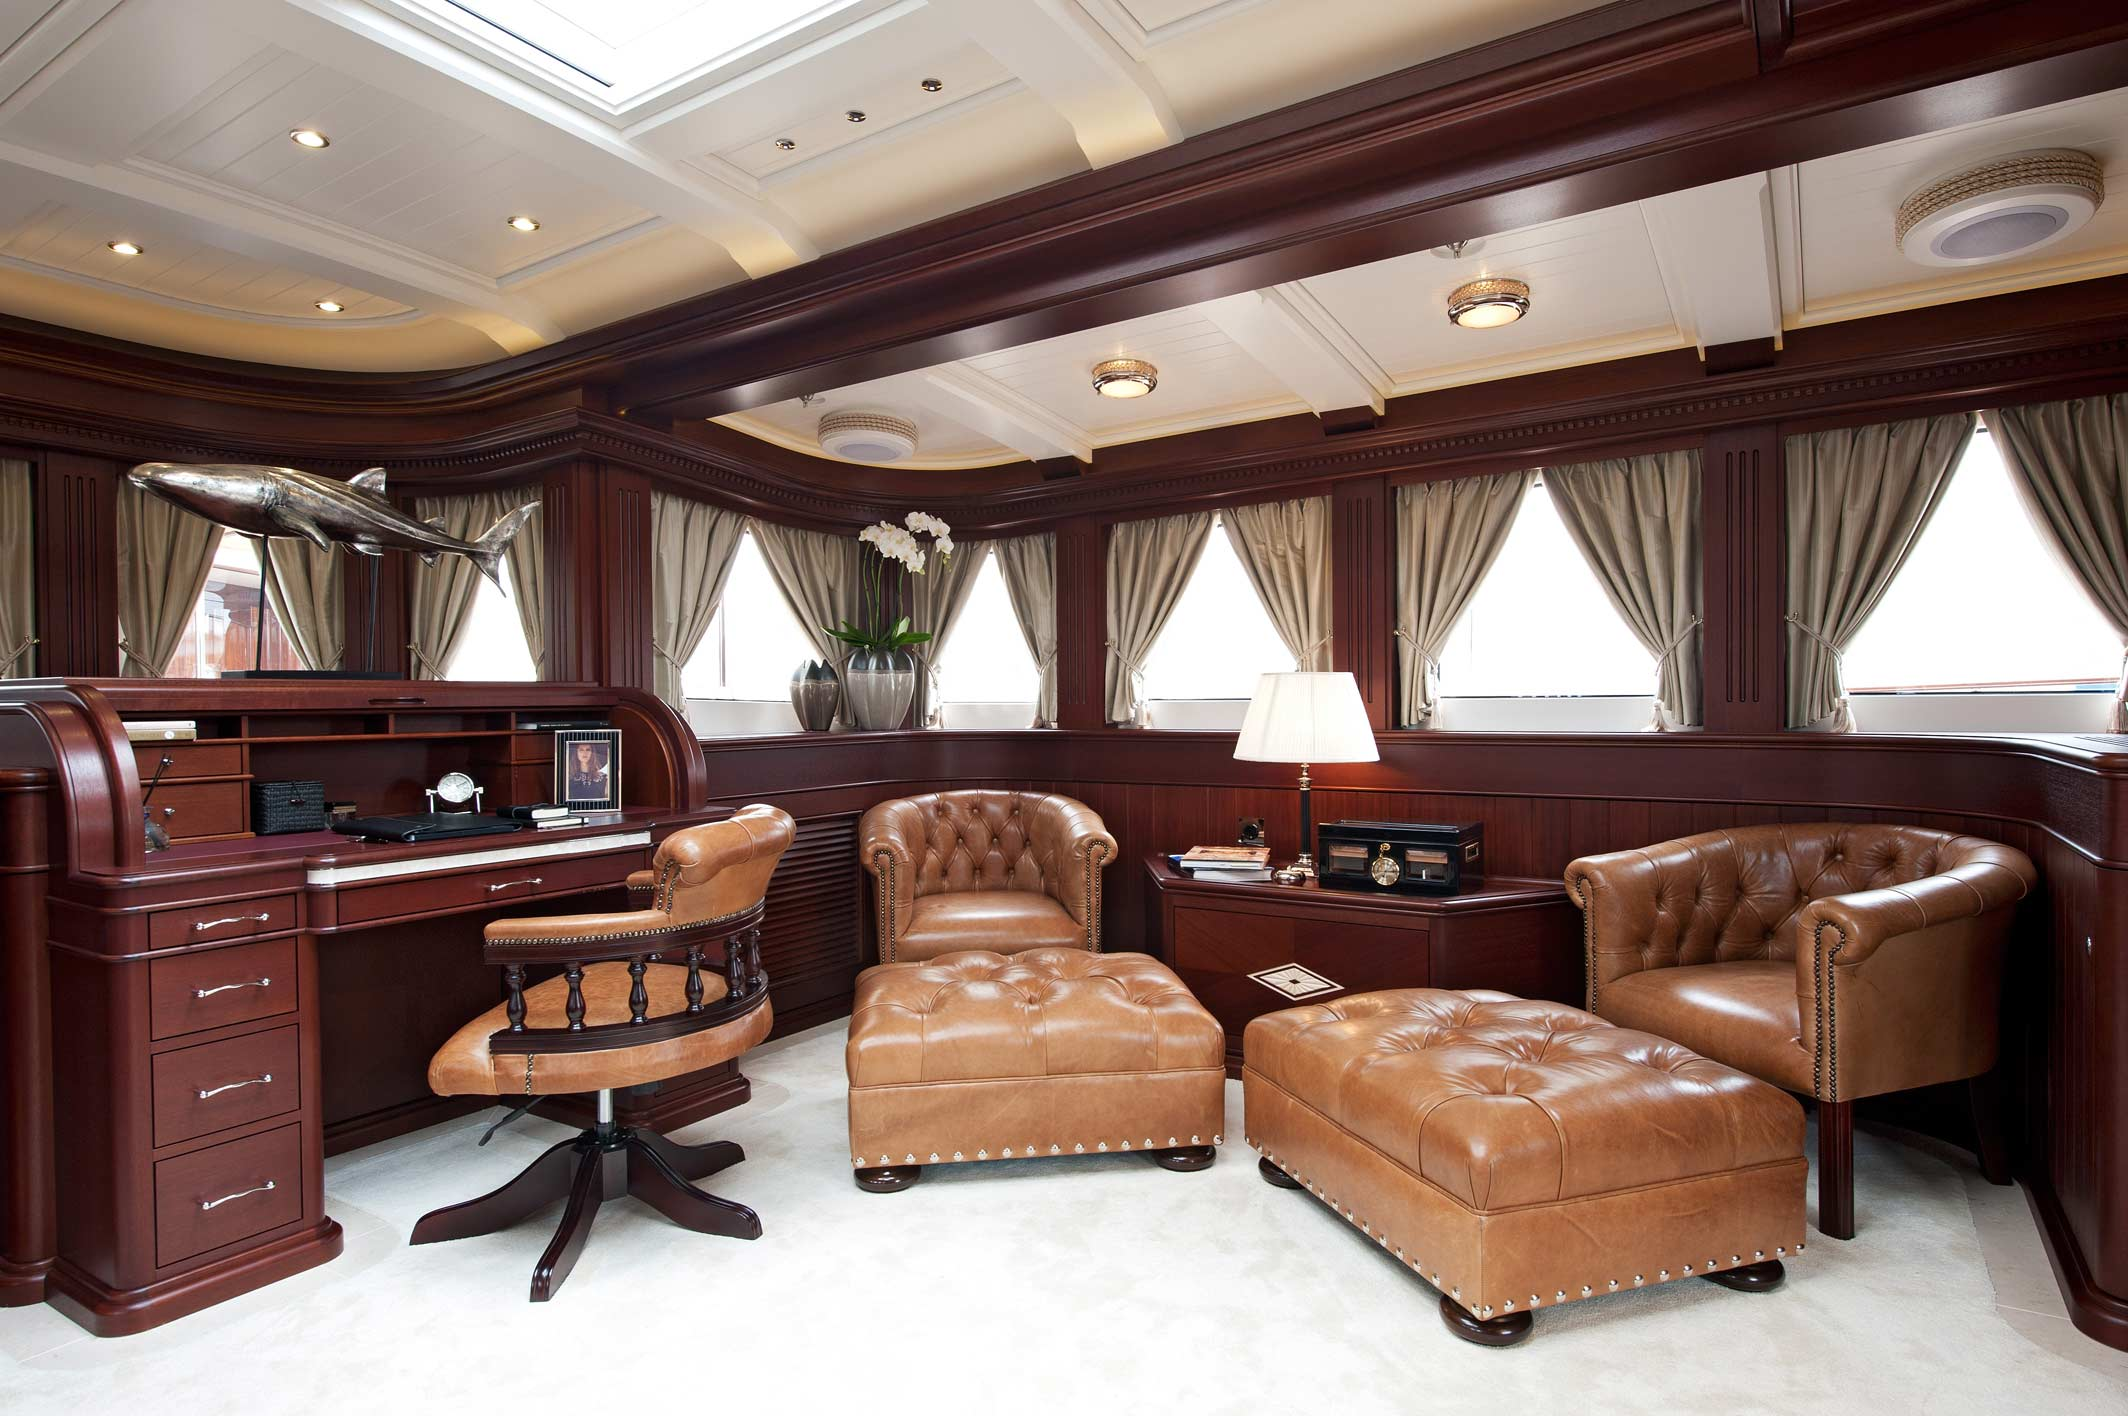 Mikhail S. Vorontsov Yacht - Owners Saloon